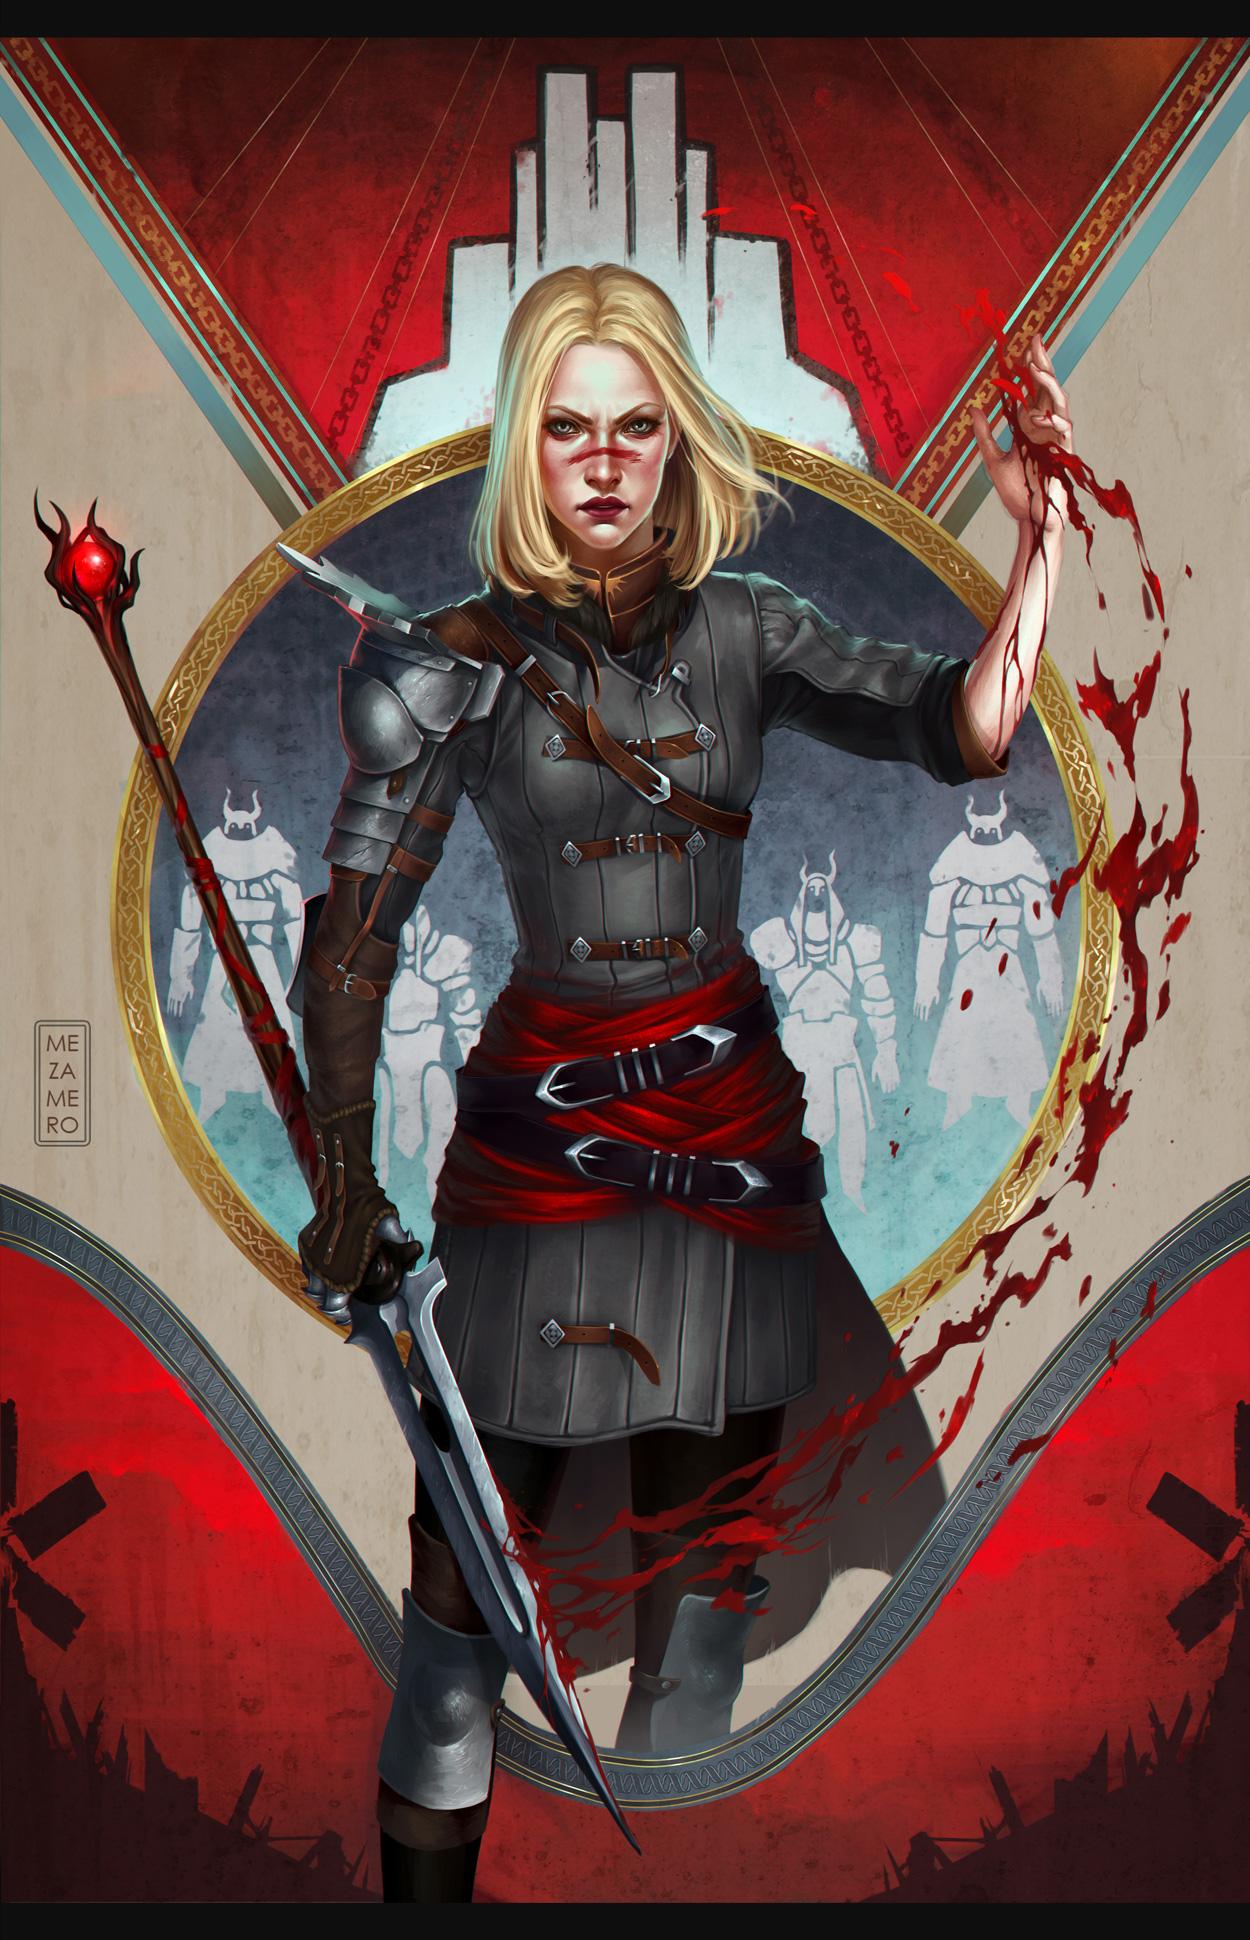 Обои Dragon Age Мечи воины Кровь Mia Hawke Фэнтези Девушки Игры Воители Фантастика